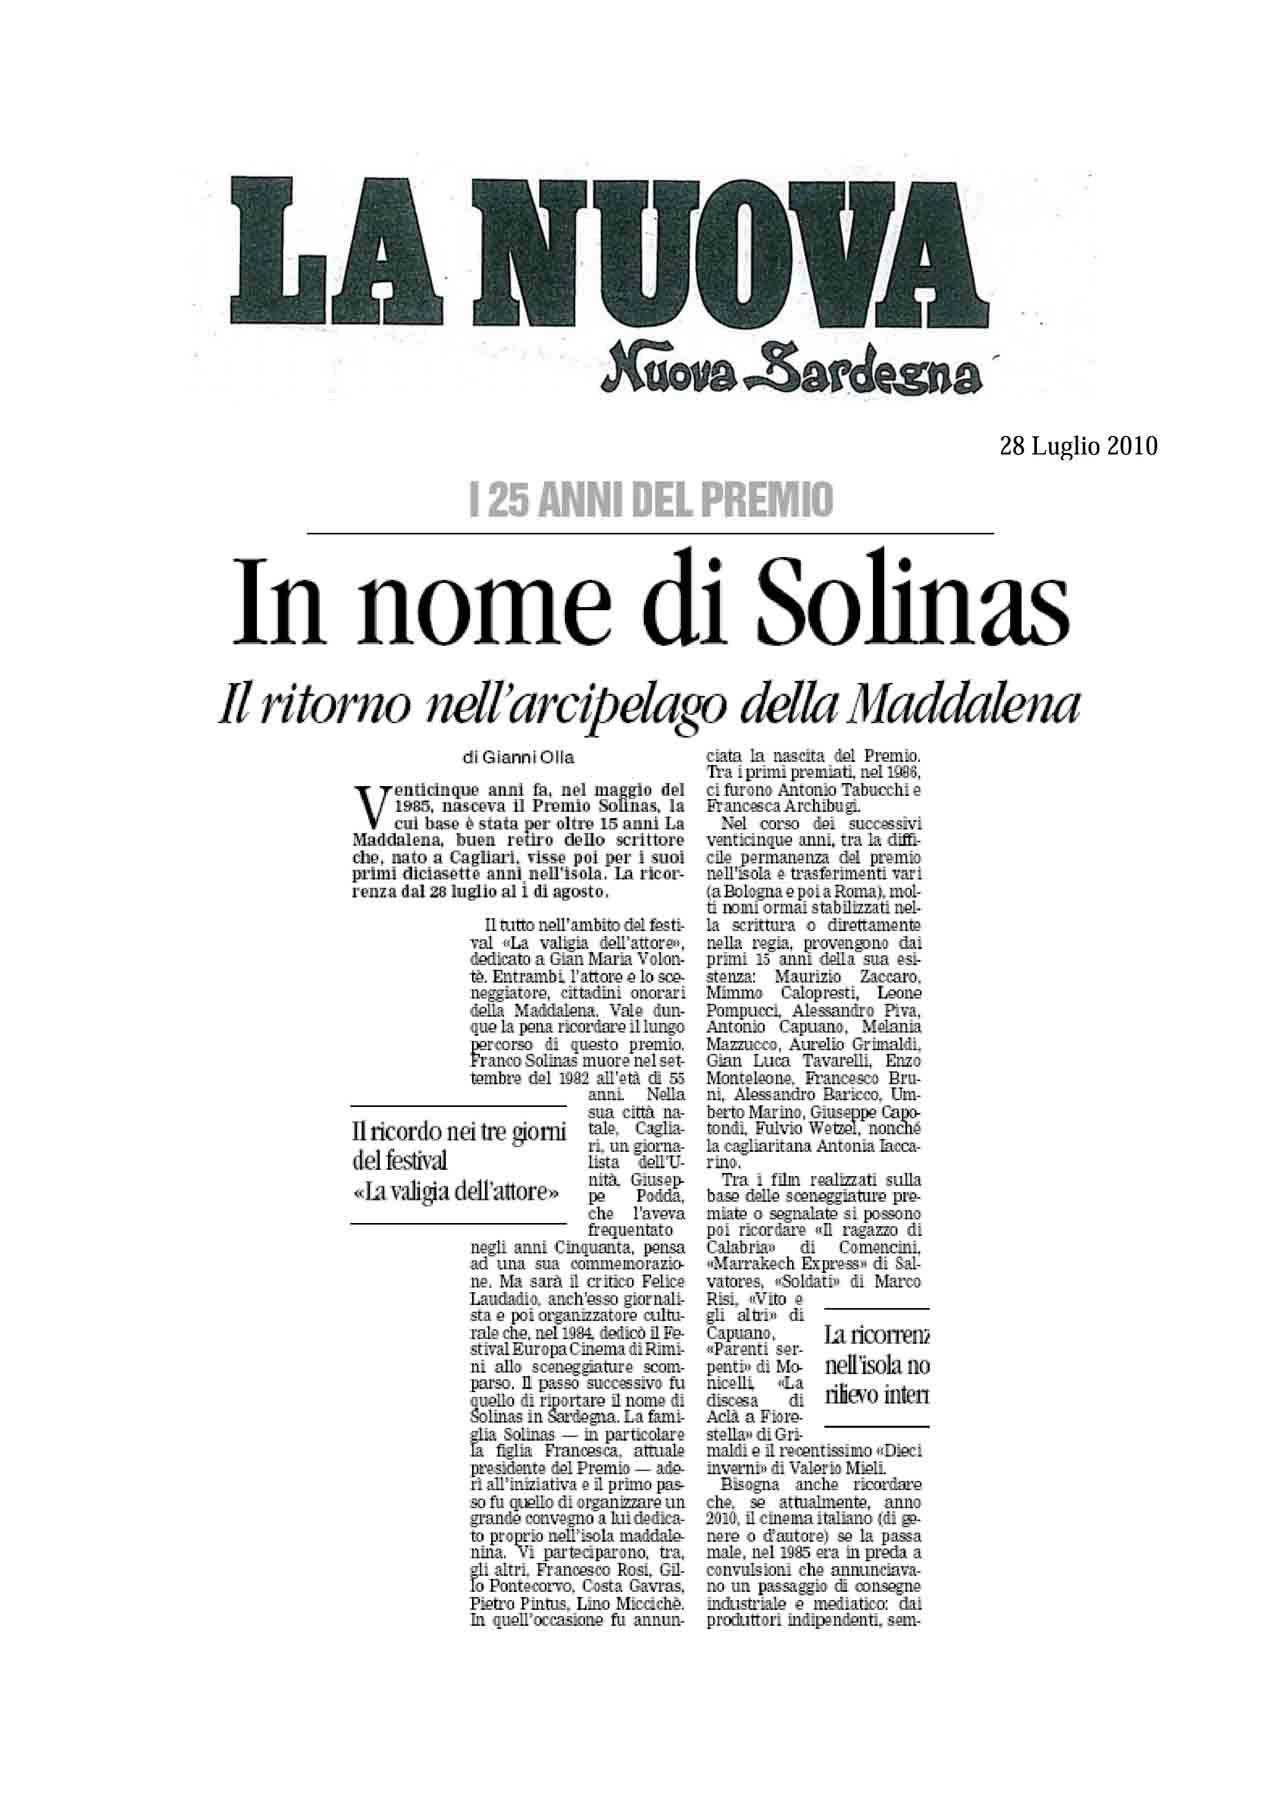 28 07 10 La Nuova Sardegna pag 1